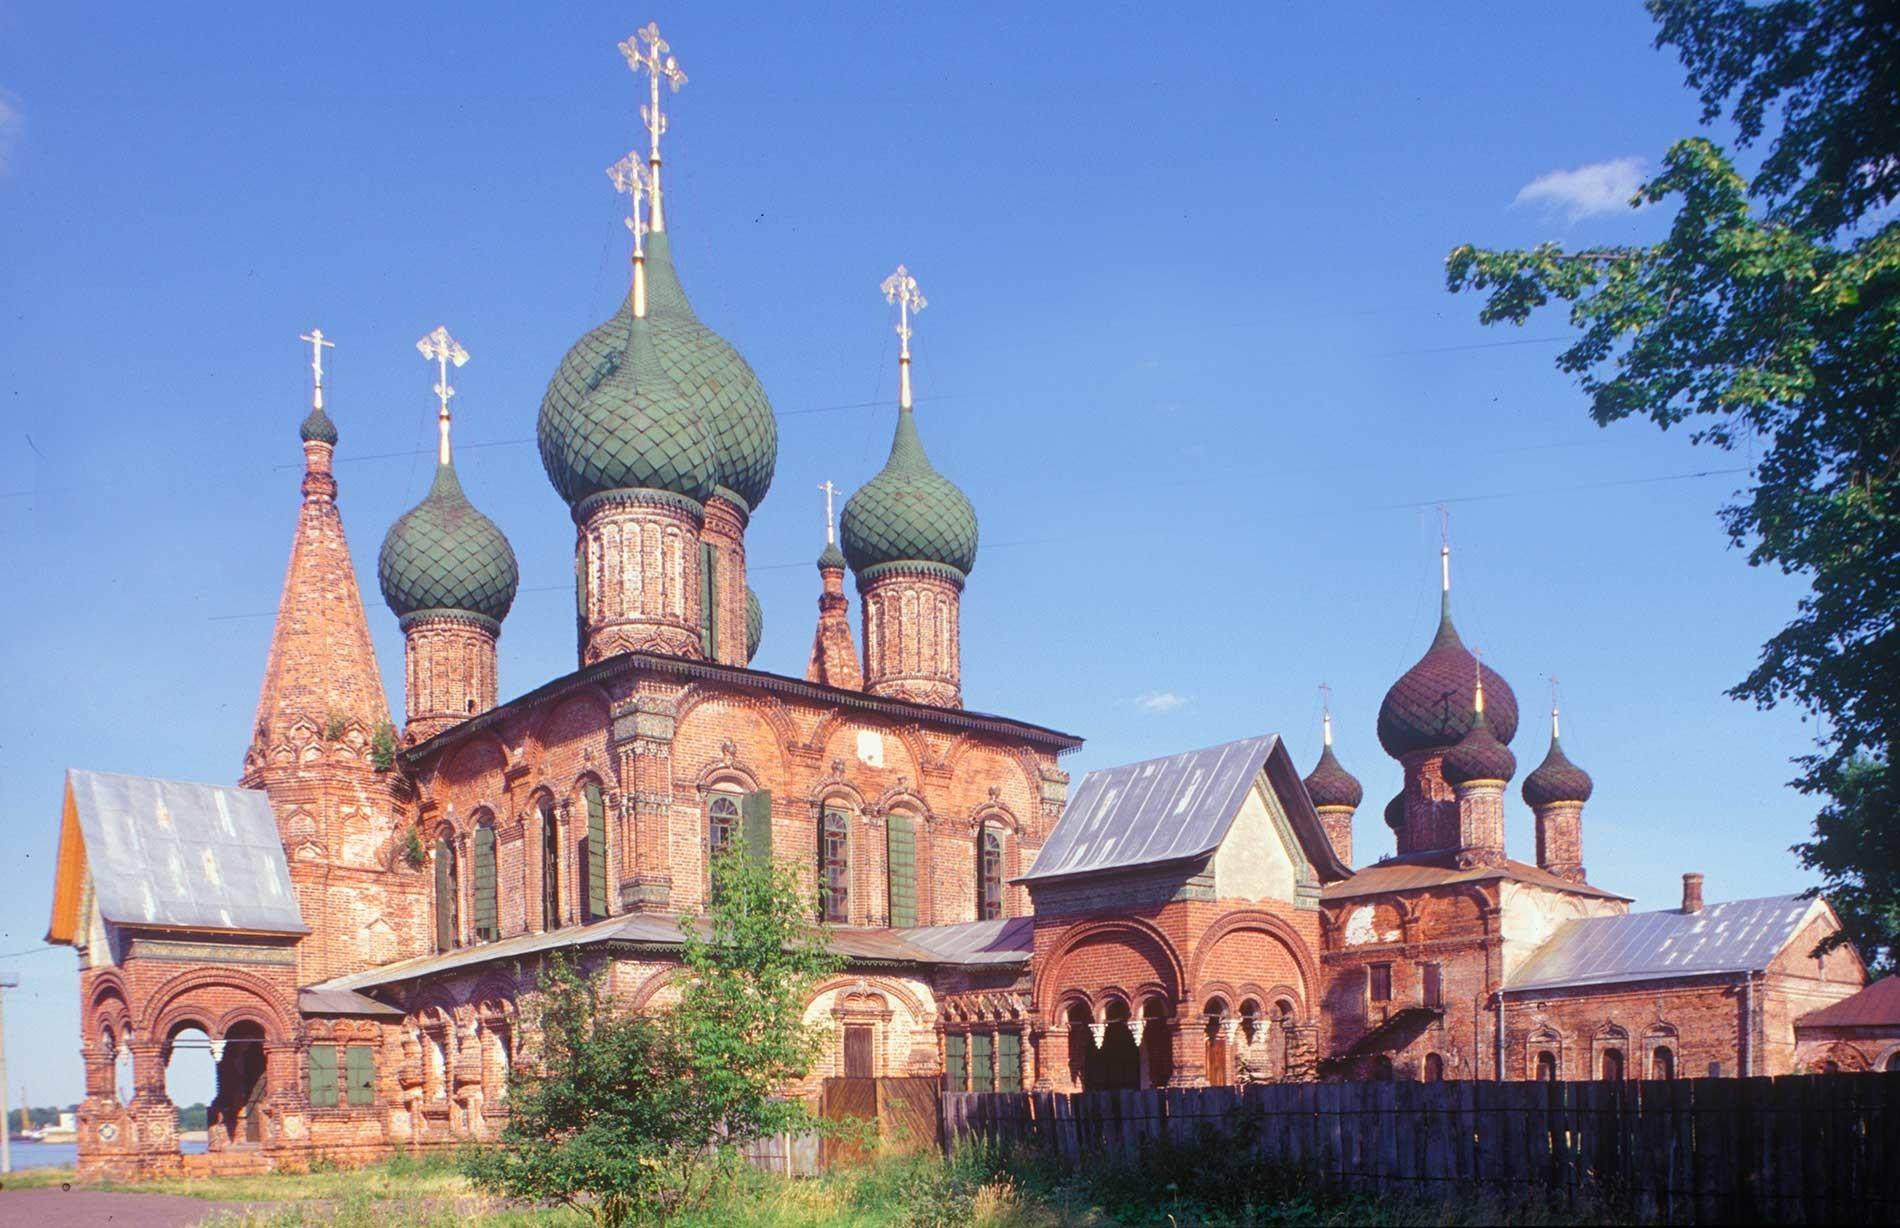 Conjunto aqruitectónico Koróvniki en Yaroslavl: Iglesia de San Juan Crisóstomo (a la izquierda), Iglesia del Icono de Vladímir. Vista noroeste. 24 de Julio de 1997.